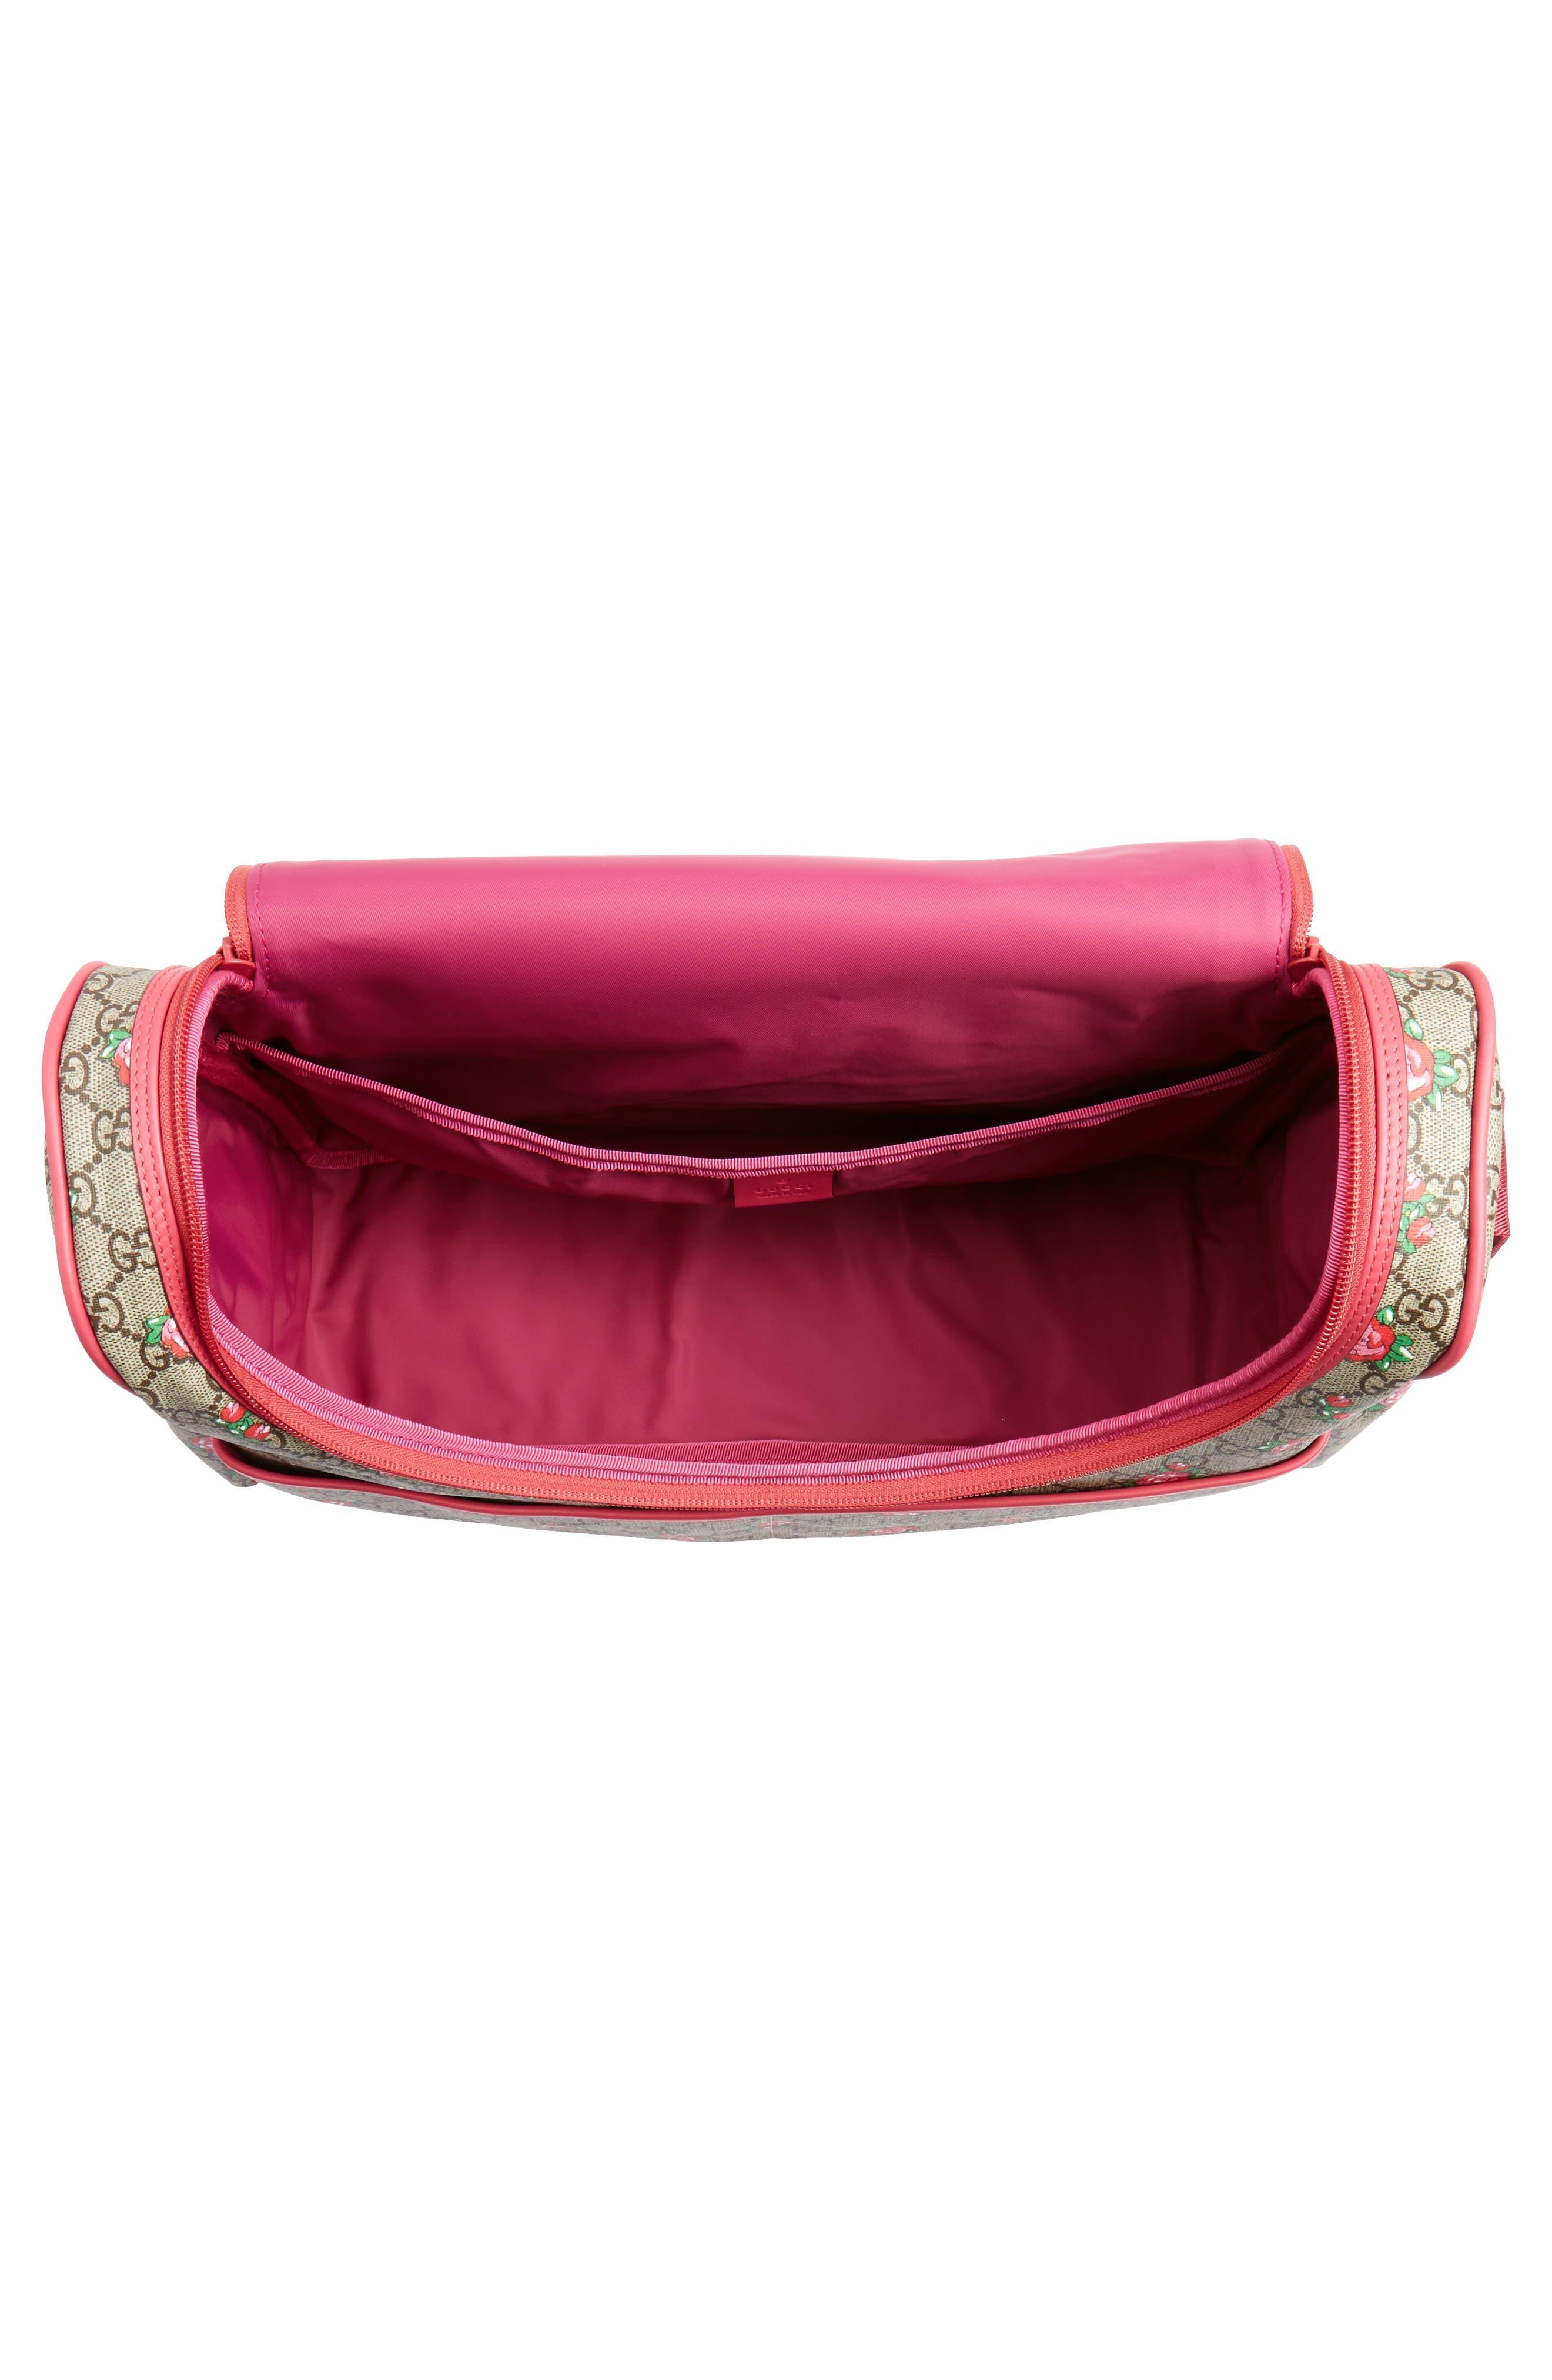 Rose Bud GG Supreme Diaper Bag,                             Alternate thumbnail 4, color,